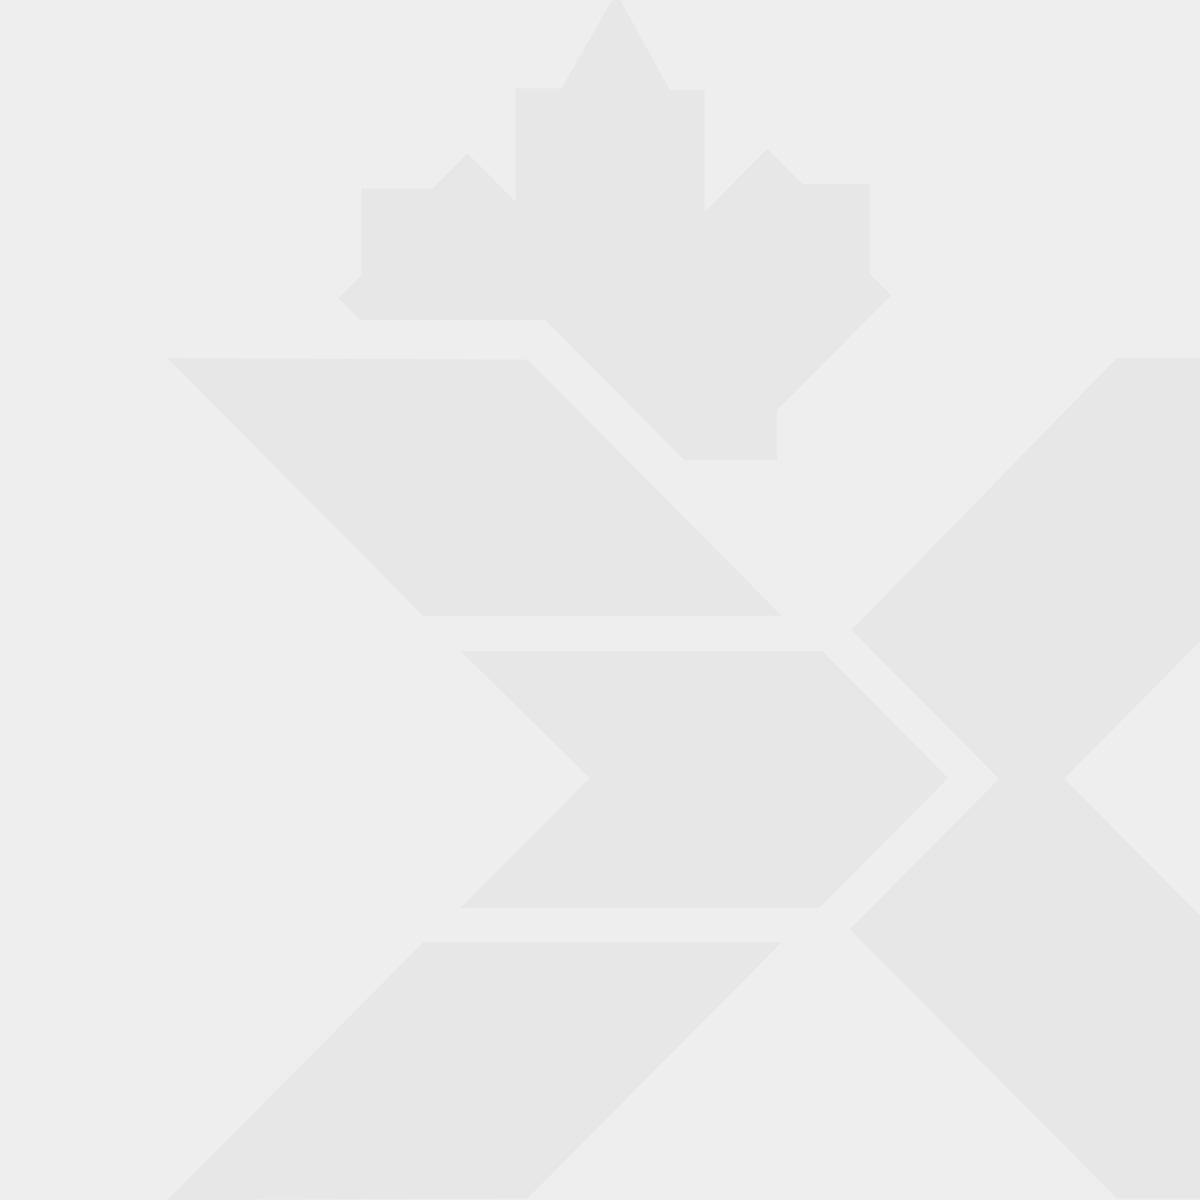 The Royal Canadian Legion Korean War Commemorative Pin - English